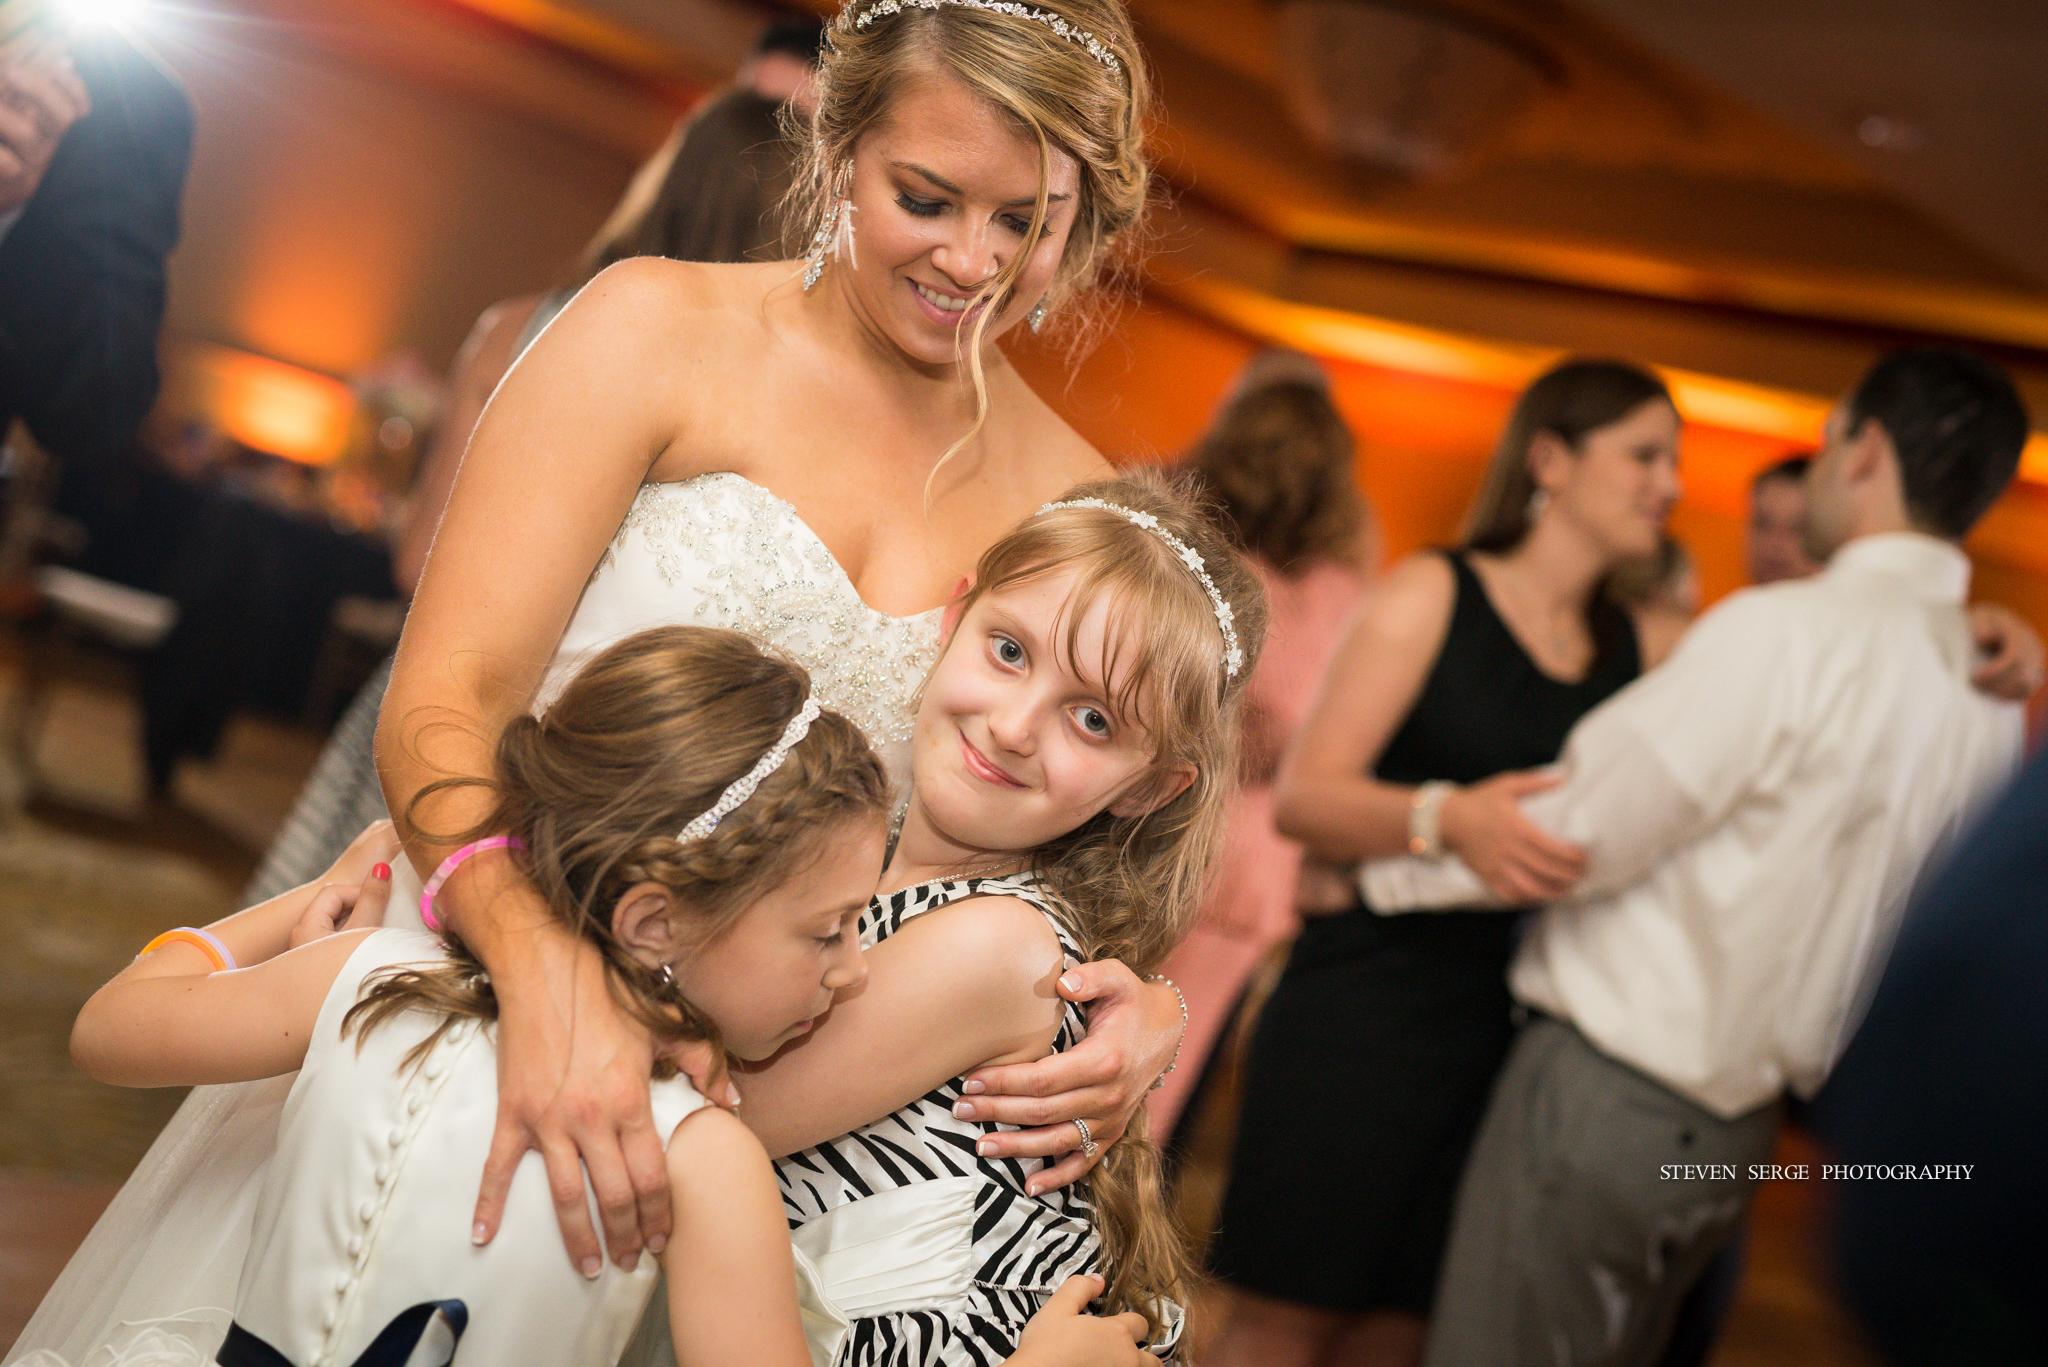 scranton-wedding-photographers-hilton-steven-serge-photography-34.jpg